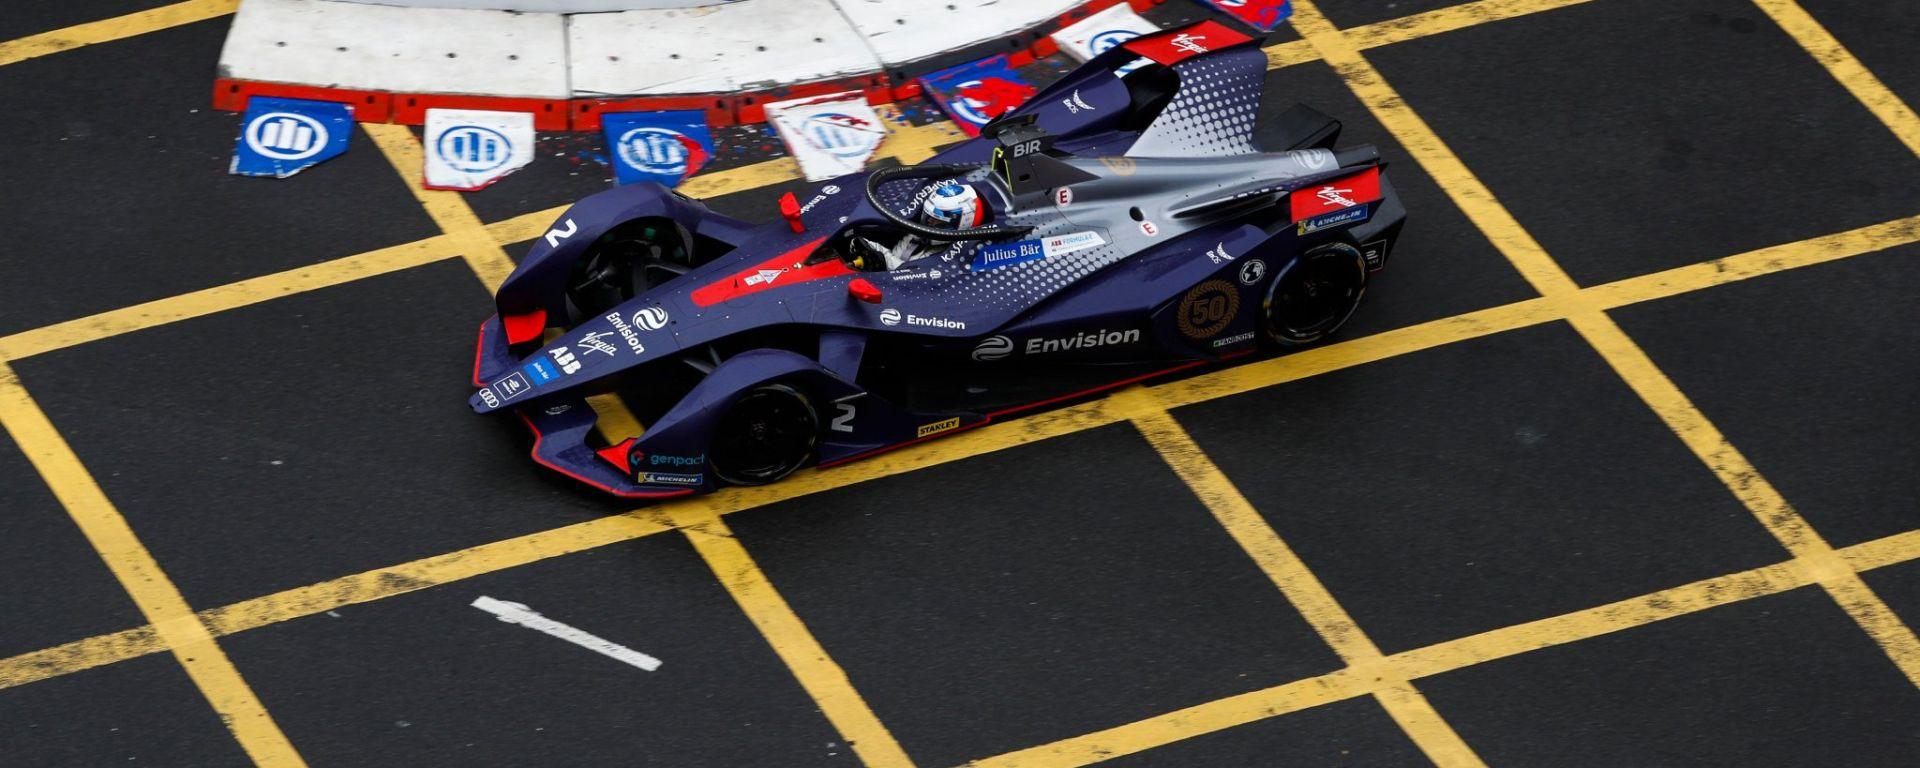 Sam Bird, leader della classifica Formula E dopo l'ePrix di Hong Kong